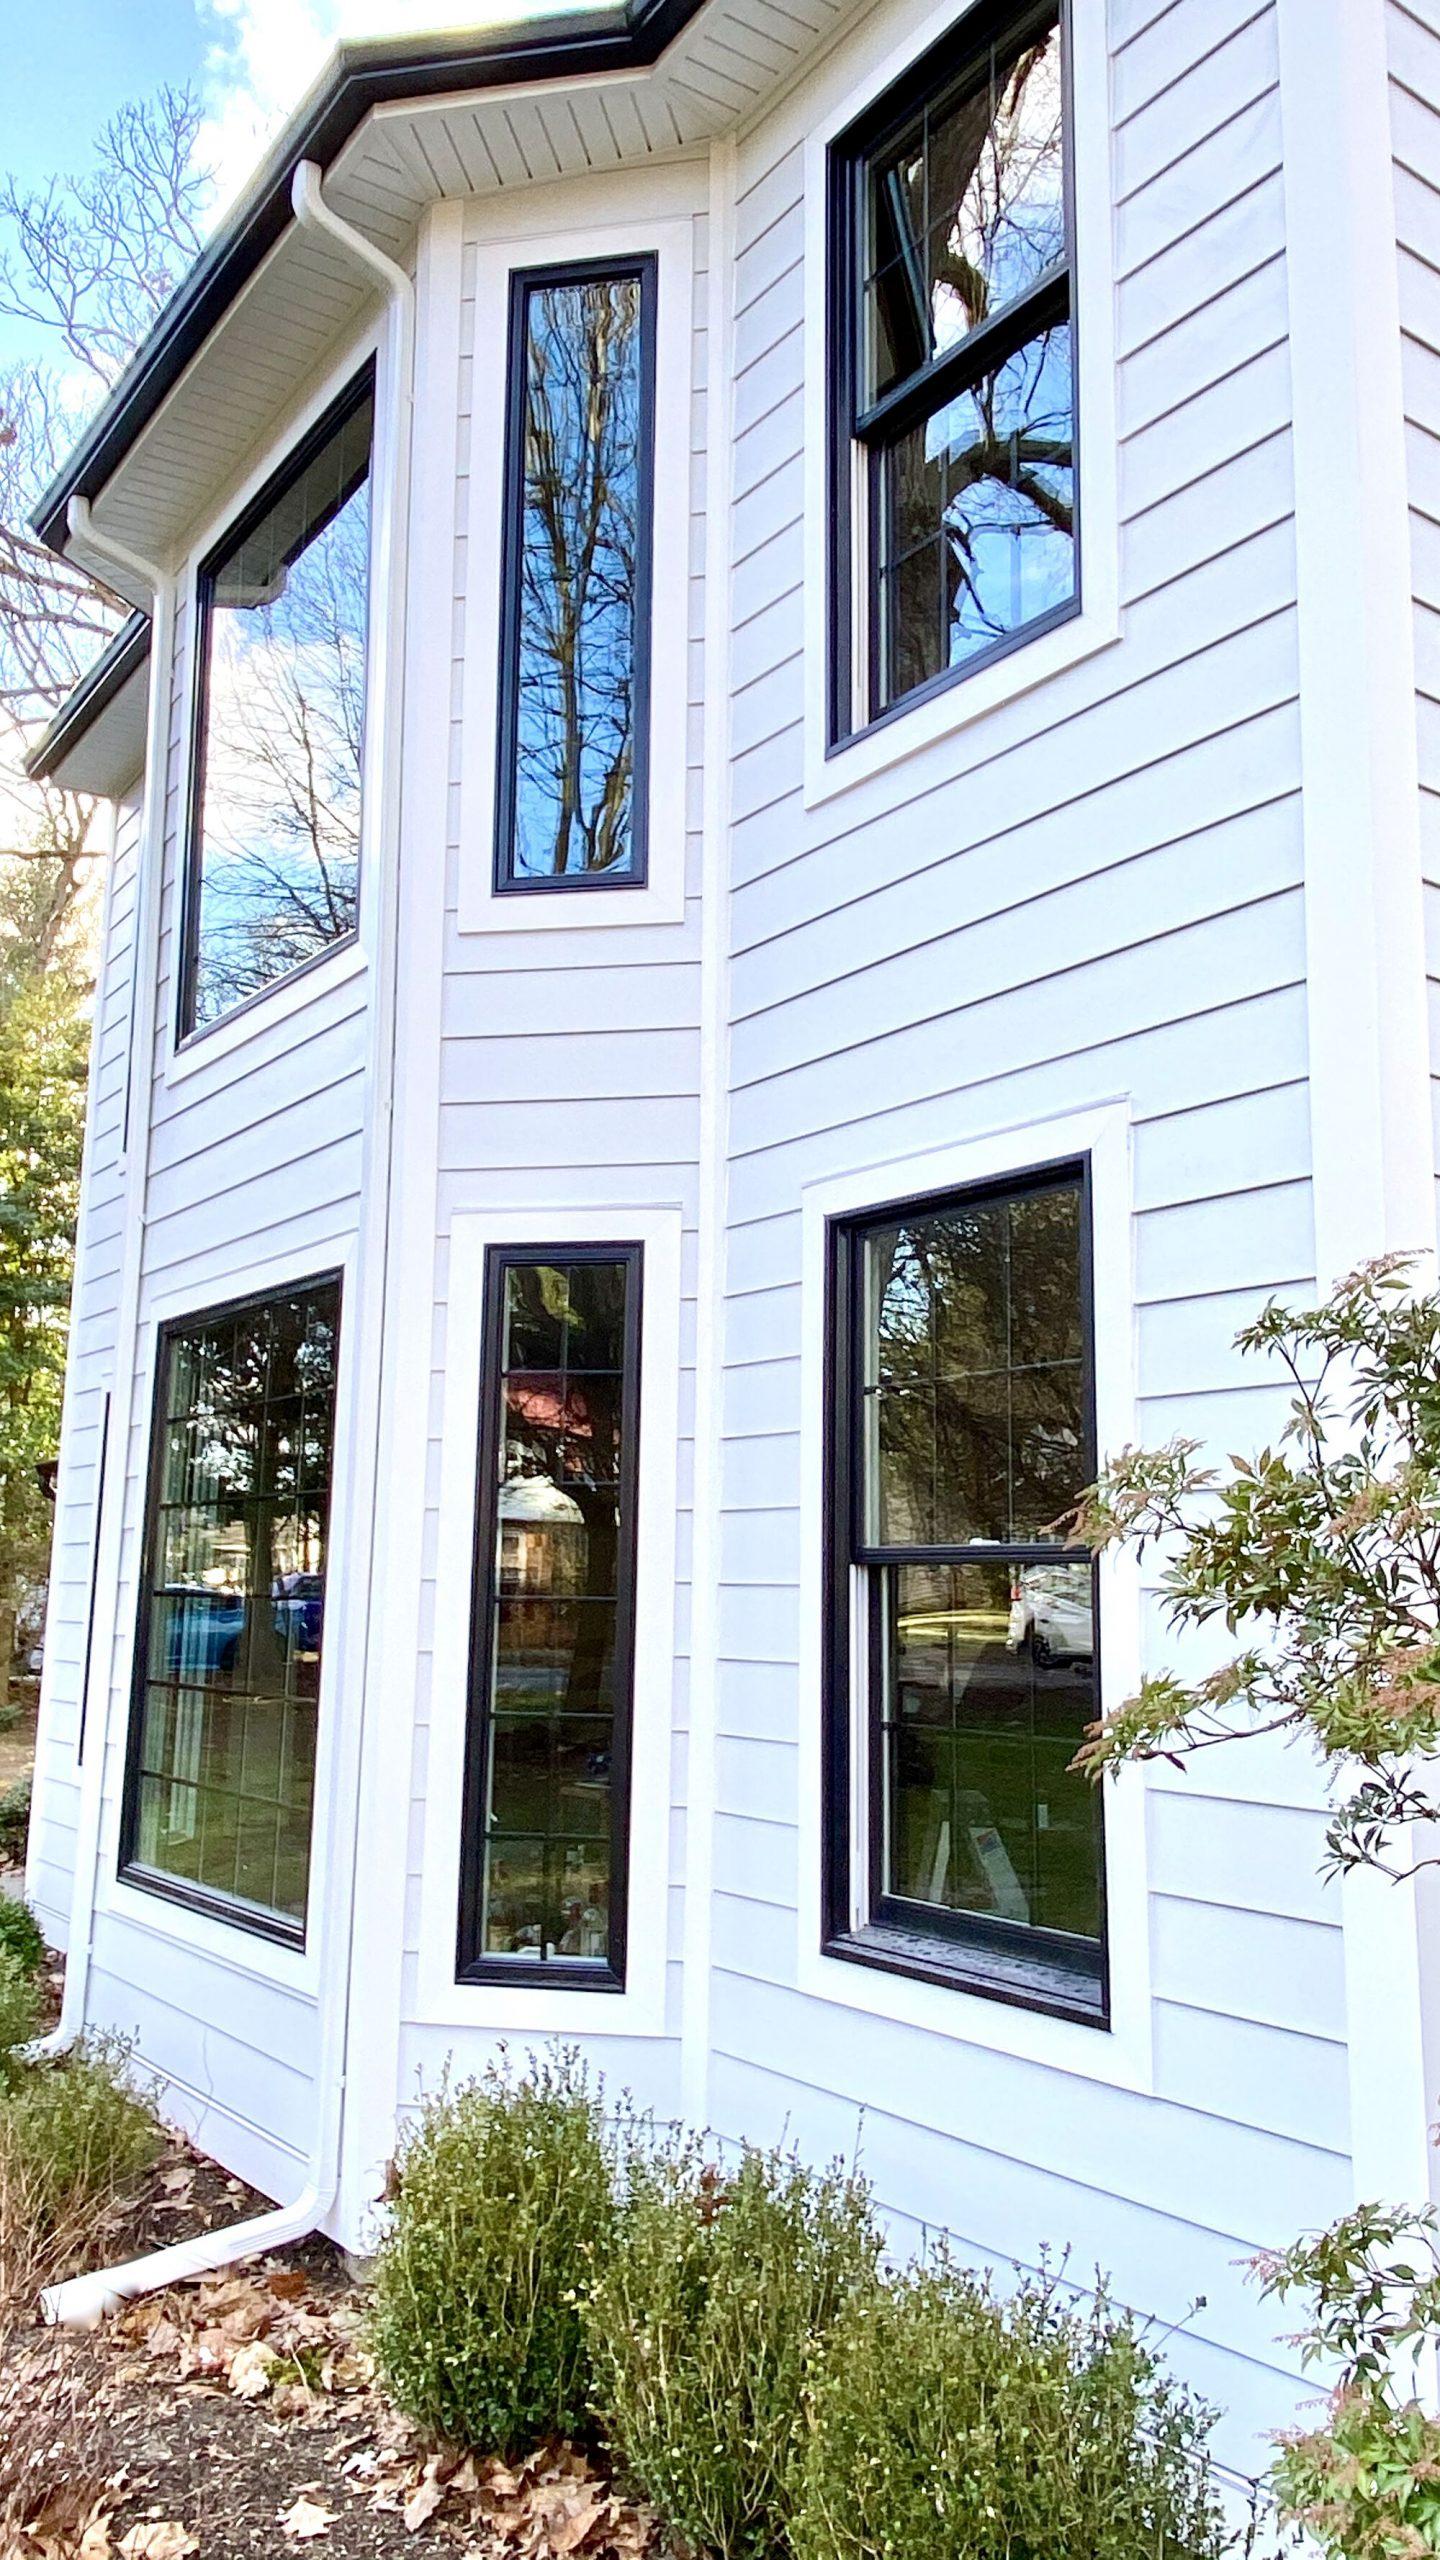 HardiePlank Smooth Clapboard Arctic White Siding, Charter Oak Soffit, Black Gutters and Leaders, Andersen 400 Series Windows in Ramsey, Bergen County NJ